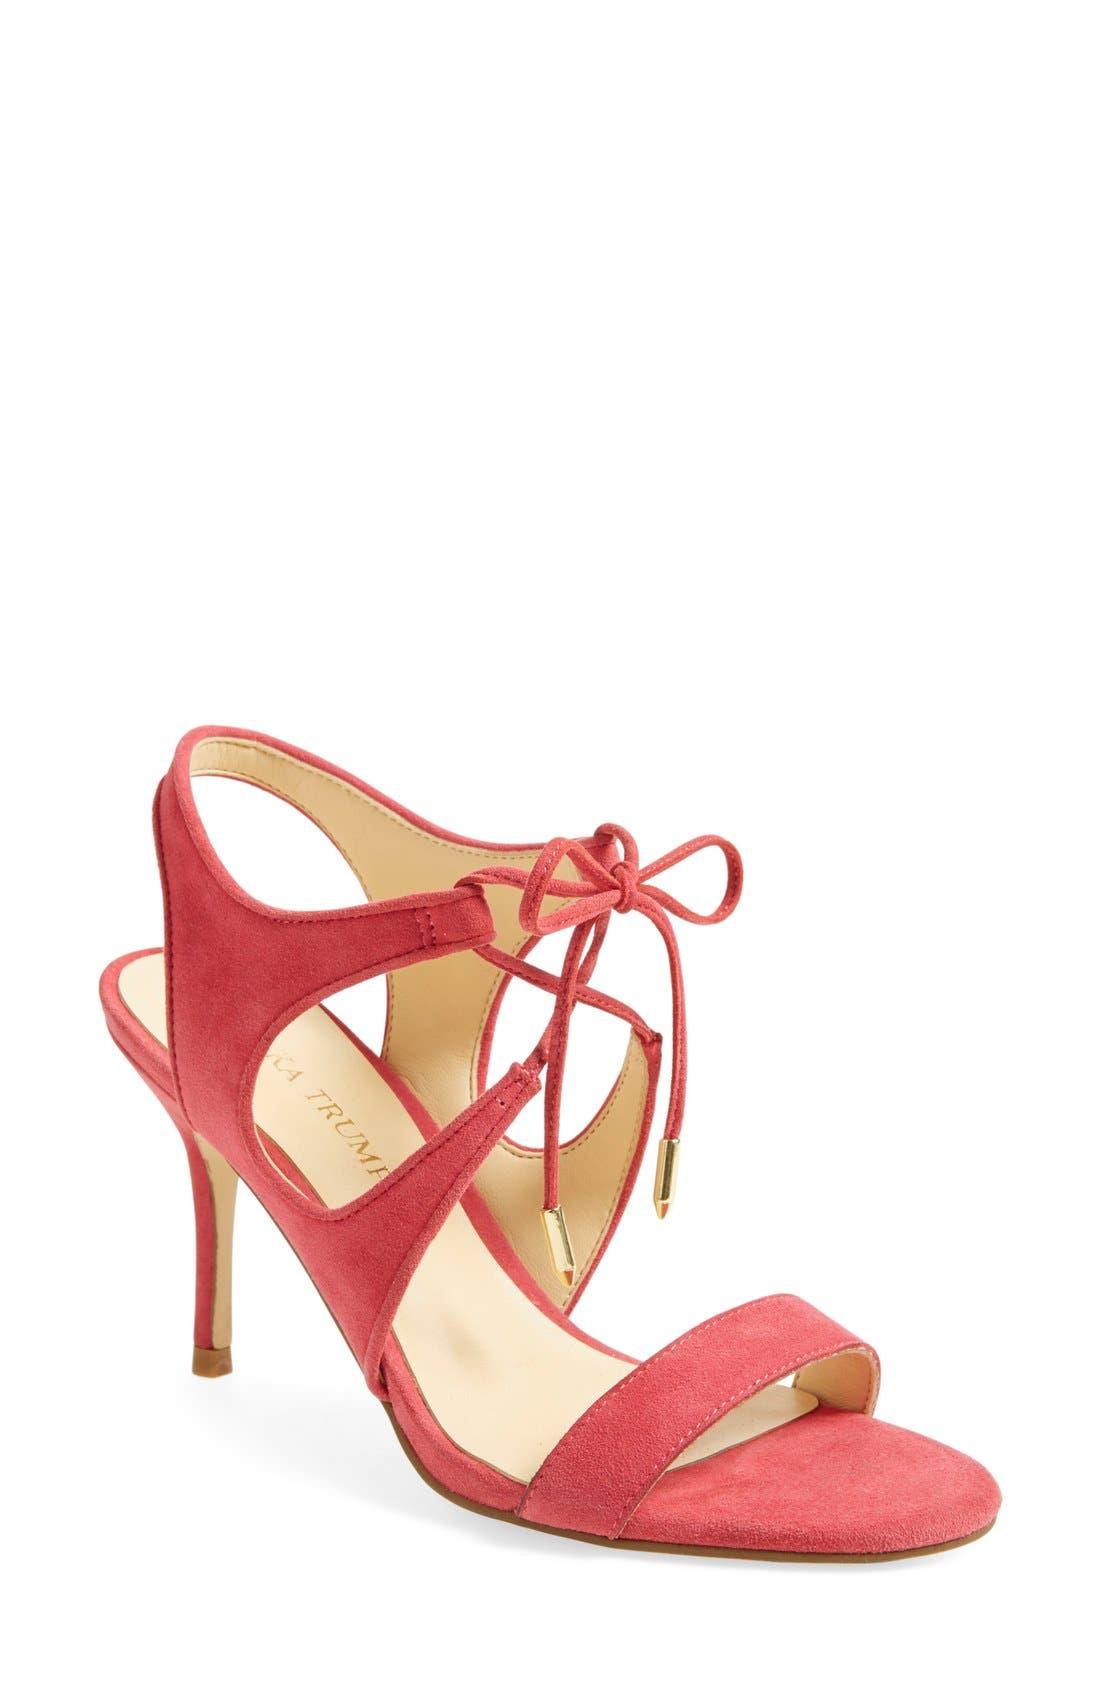 Main Image - Ivanka Trump 'Garver' Sandal (Women)